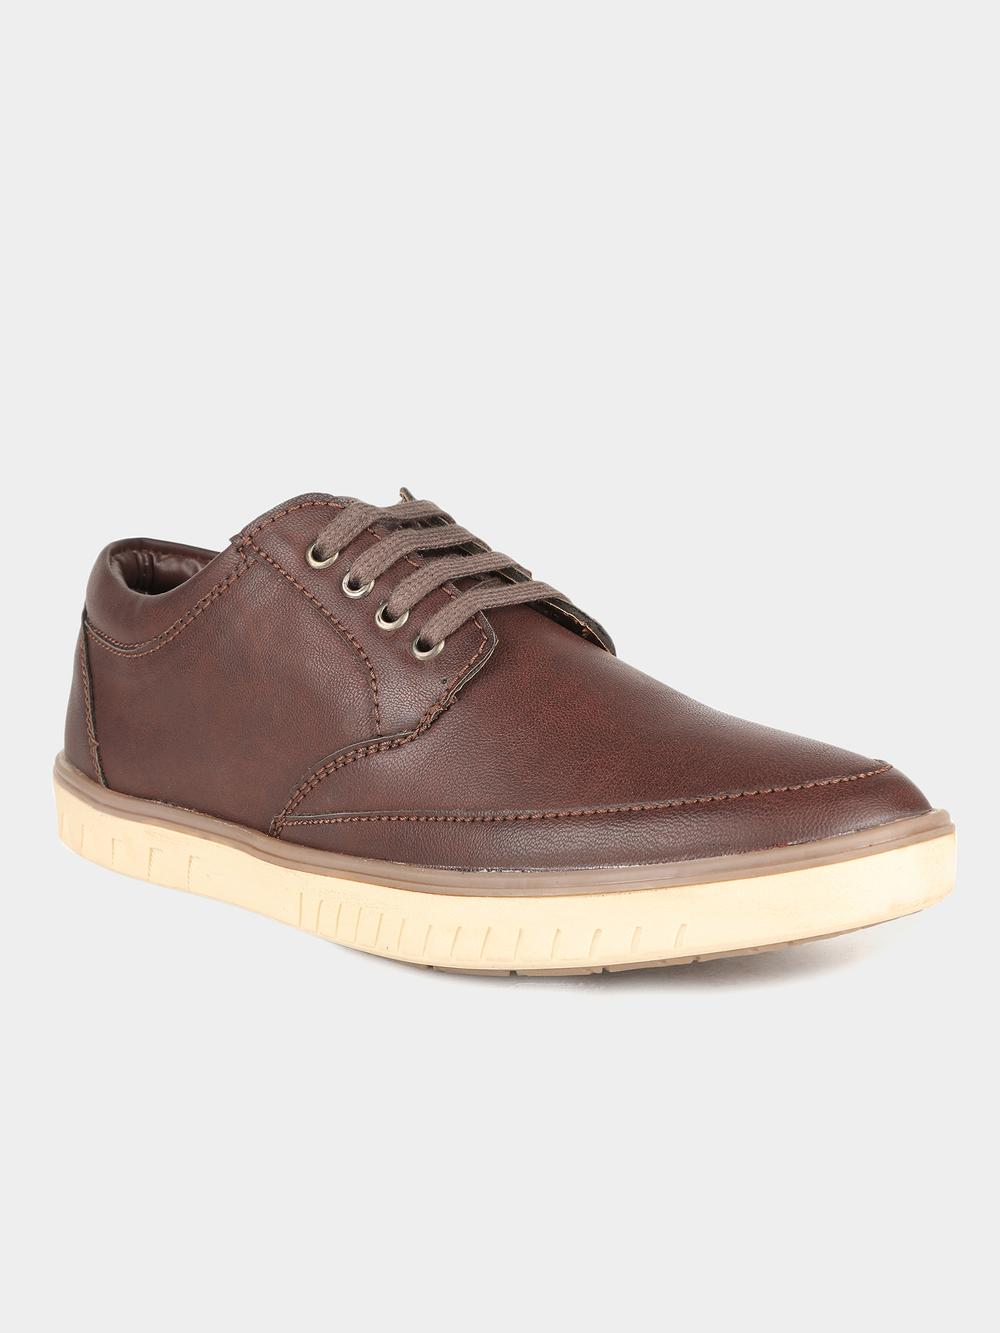 4703950a83cc Abof Men s Footwear - Buy Shoes for Men Online in India